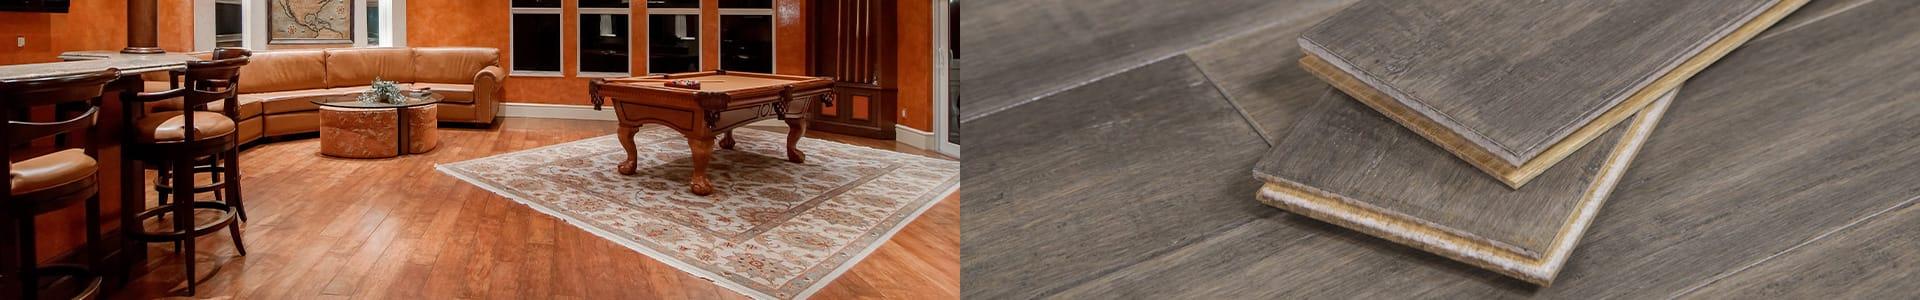 Monavé Hardwood Flooring Products